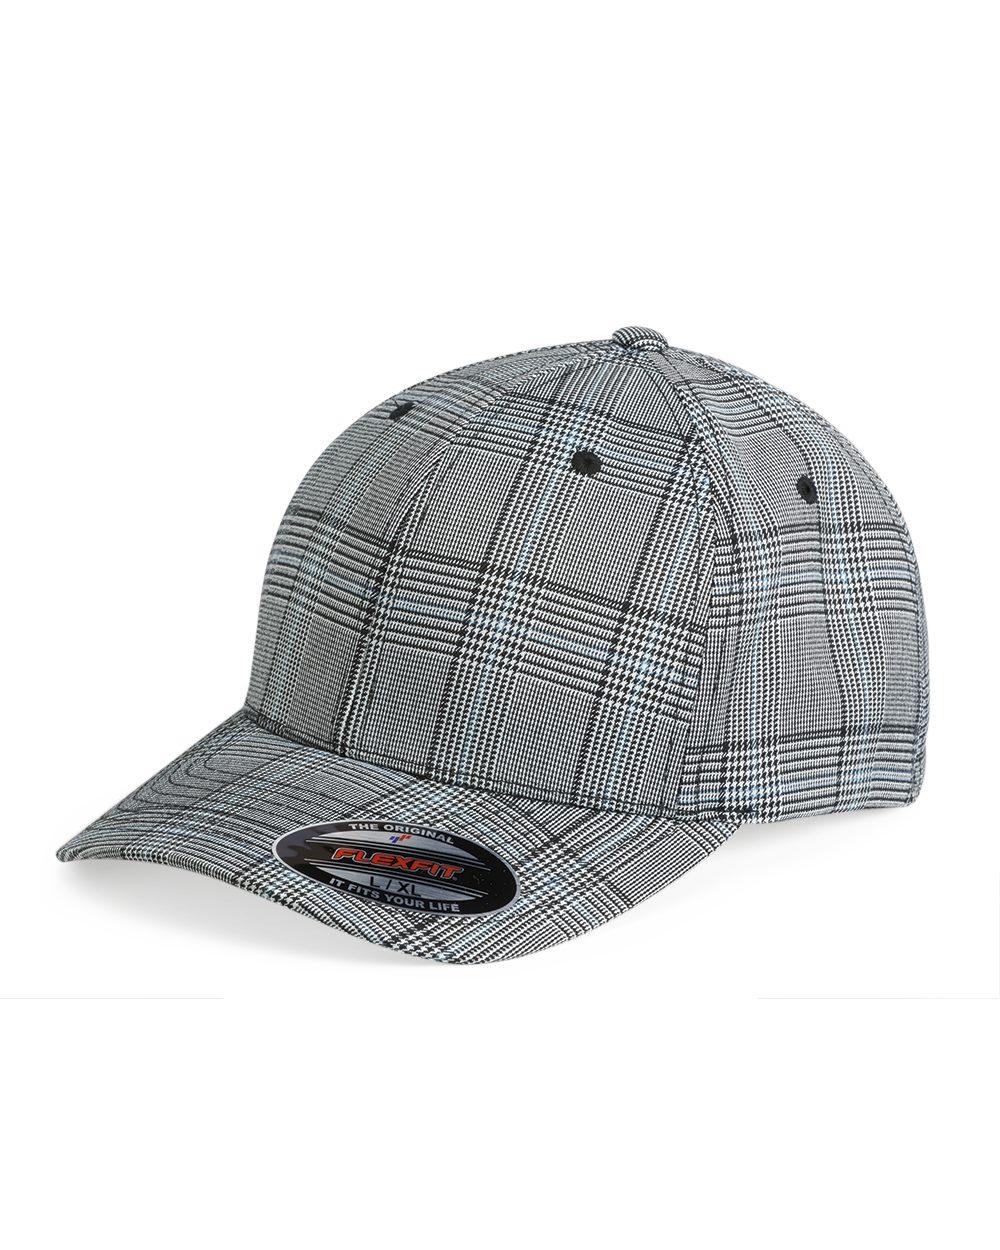 Flexfit 6197 - Tartan Plaid Cap